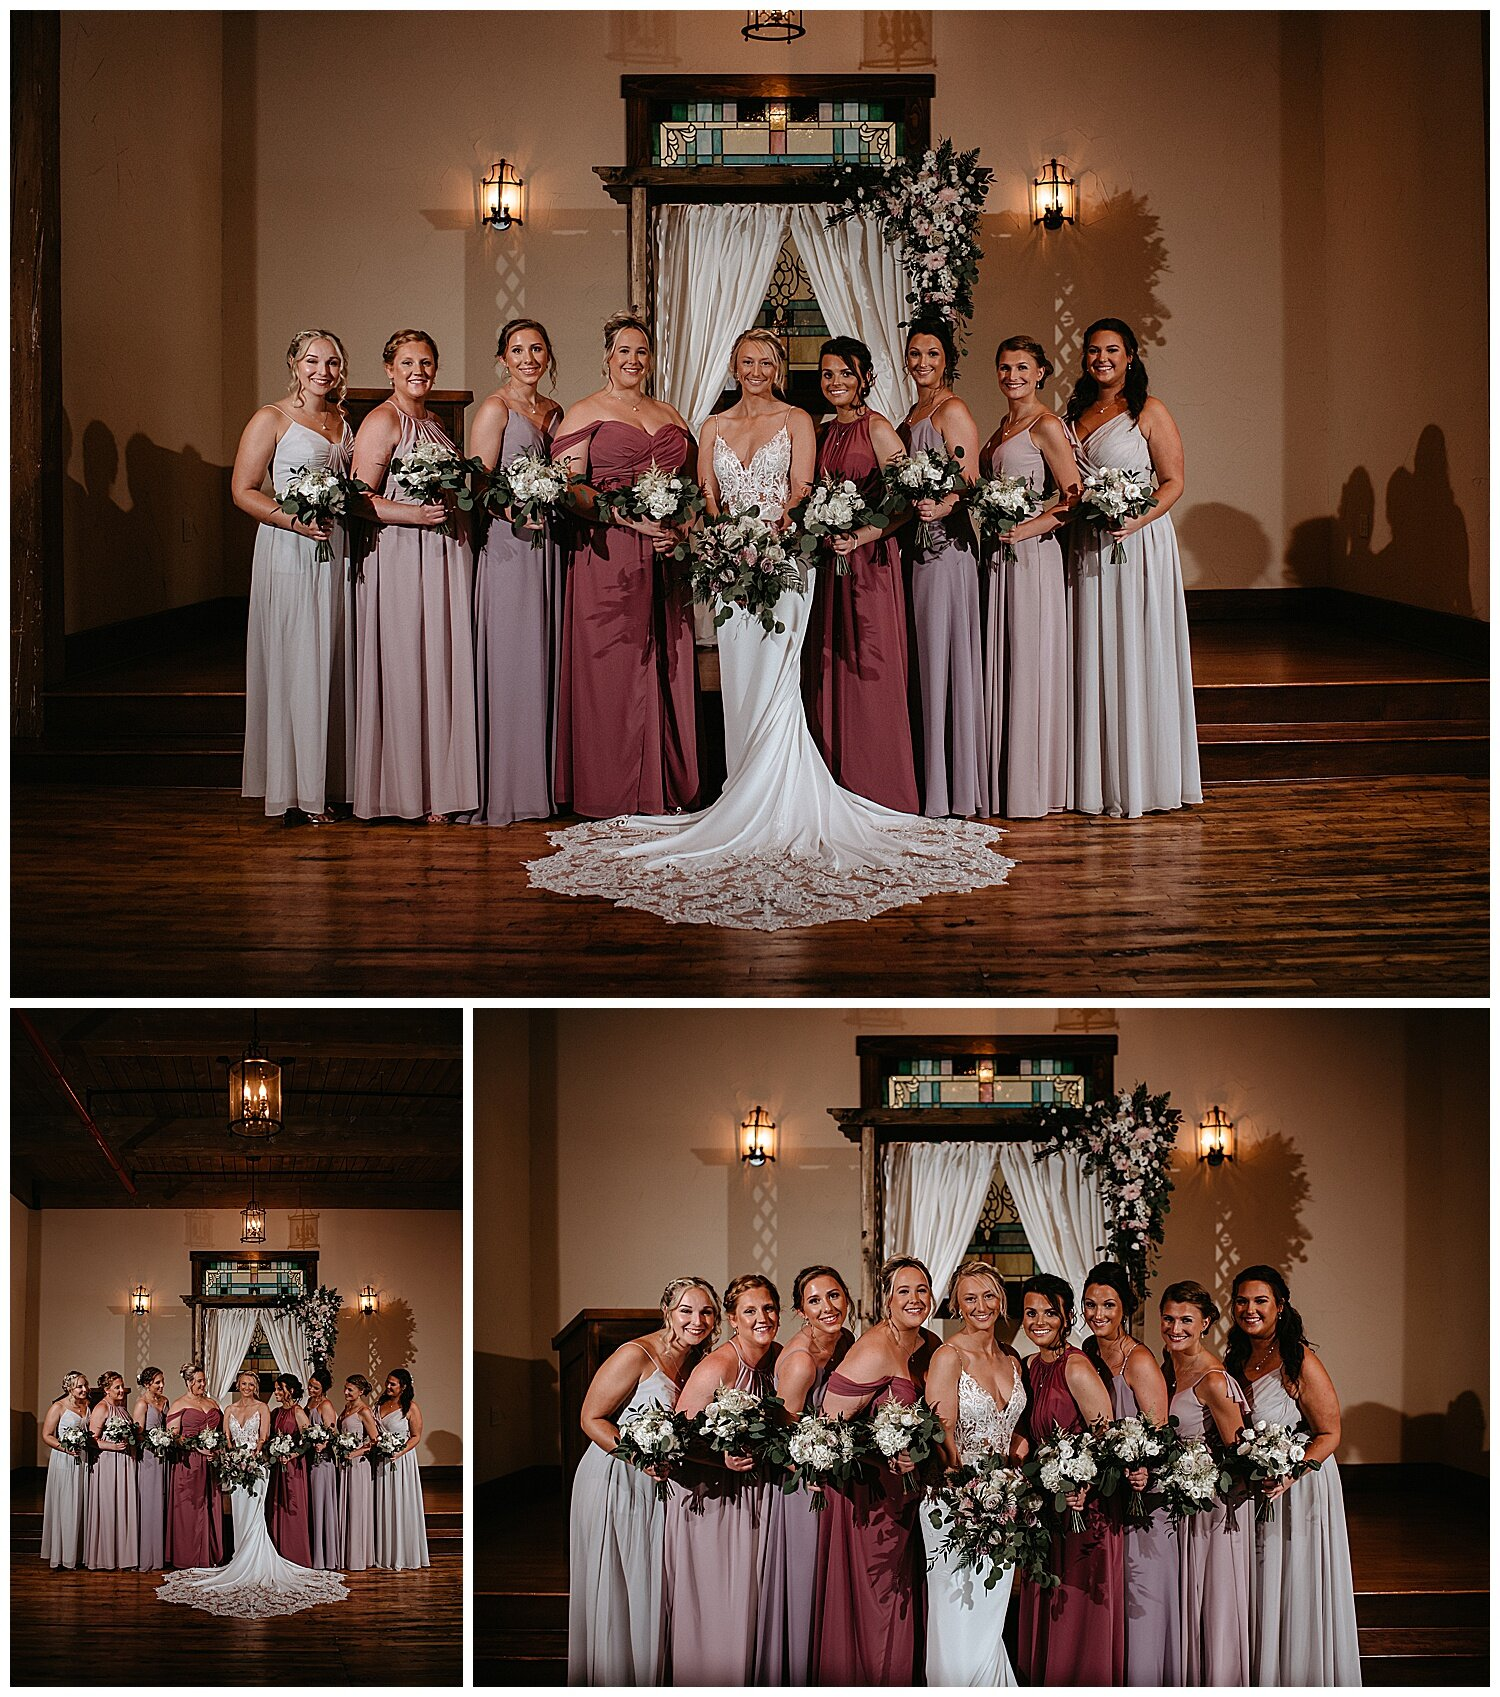 NEPA-Lewisburg-Wedding-Photographer-at-the-Rusty-Rail_0024.jpg